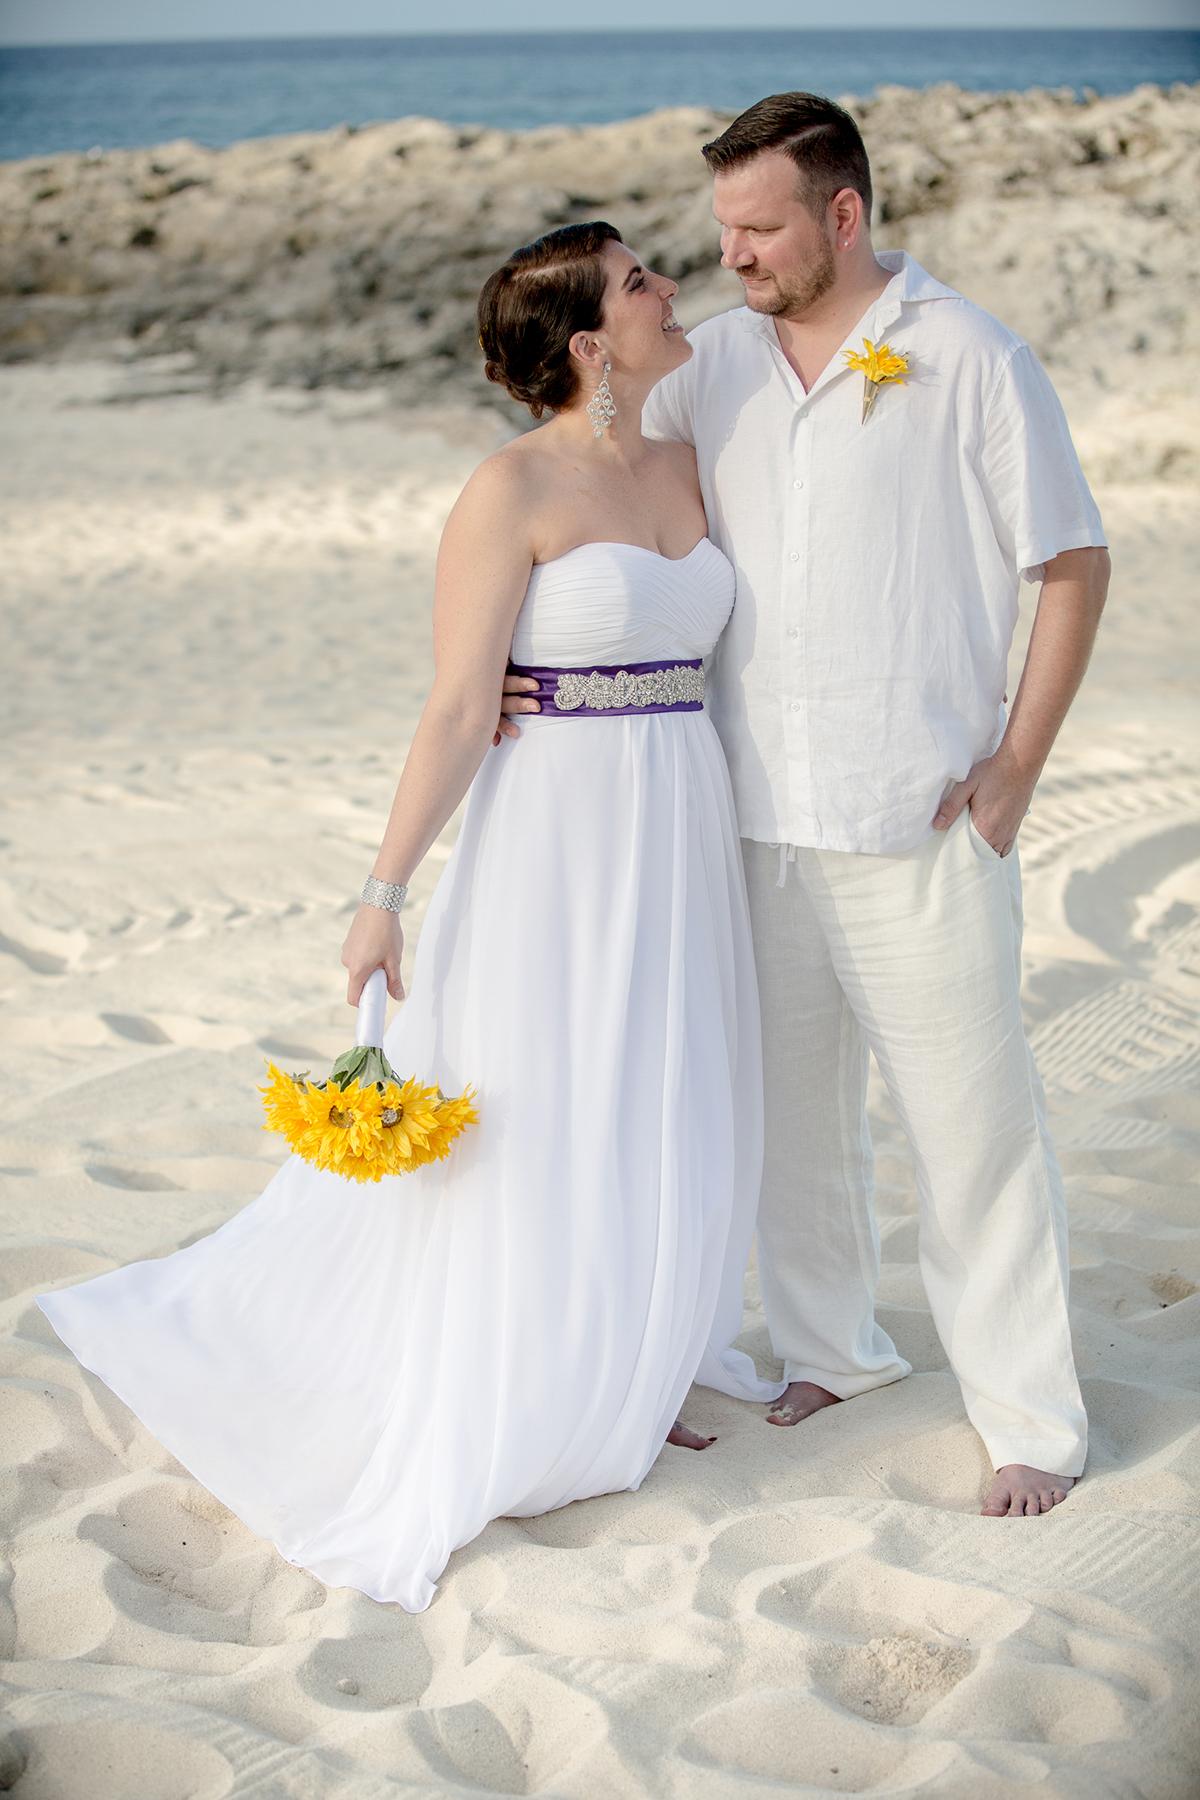 Daniela-Edvard_wedding_Dukat-Photos-1325.jpg